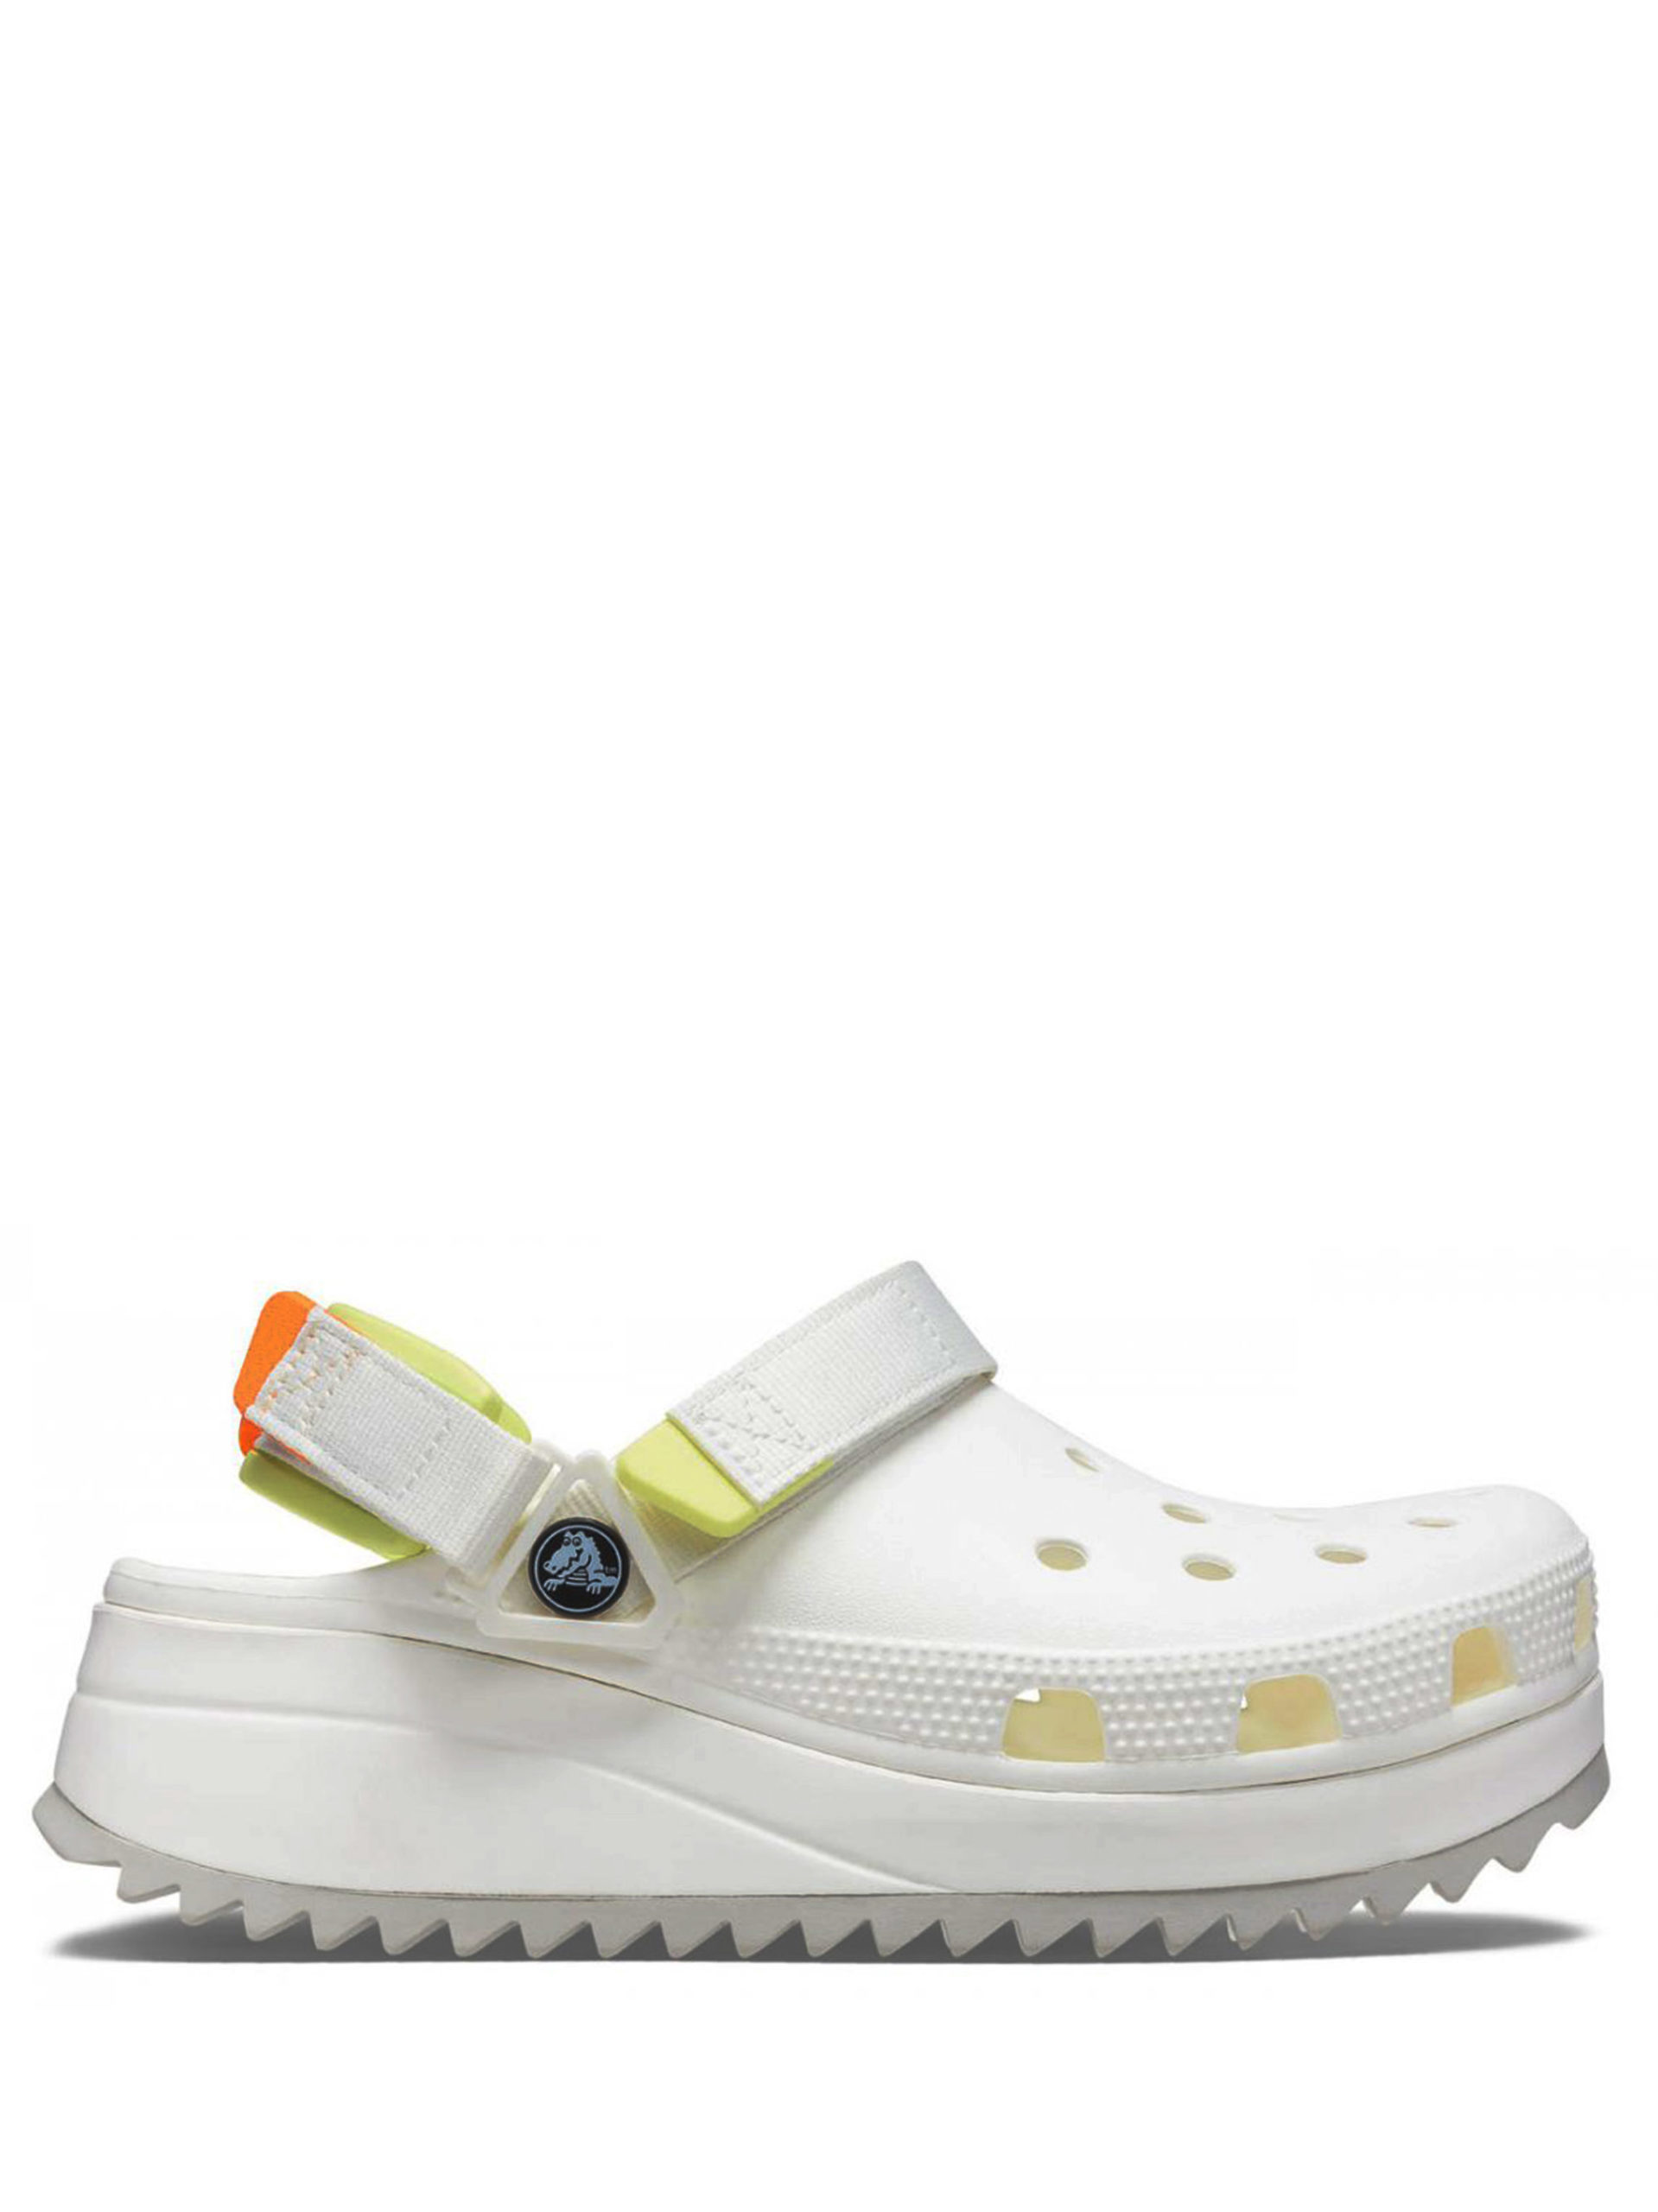 <p class='small-title'>CROCS</p>Shoes